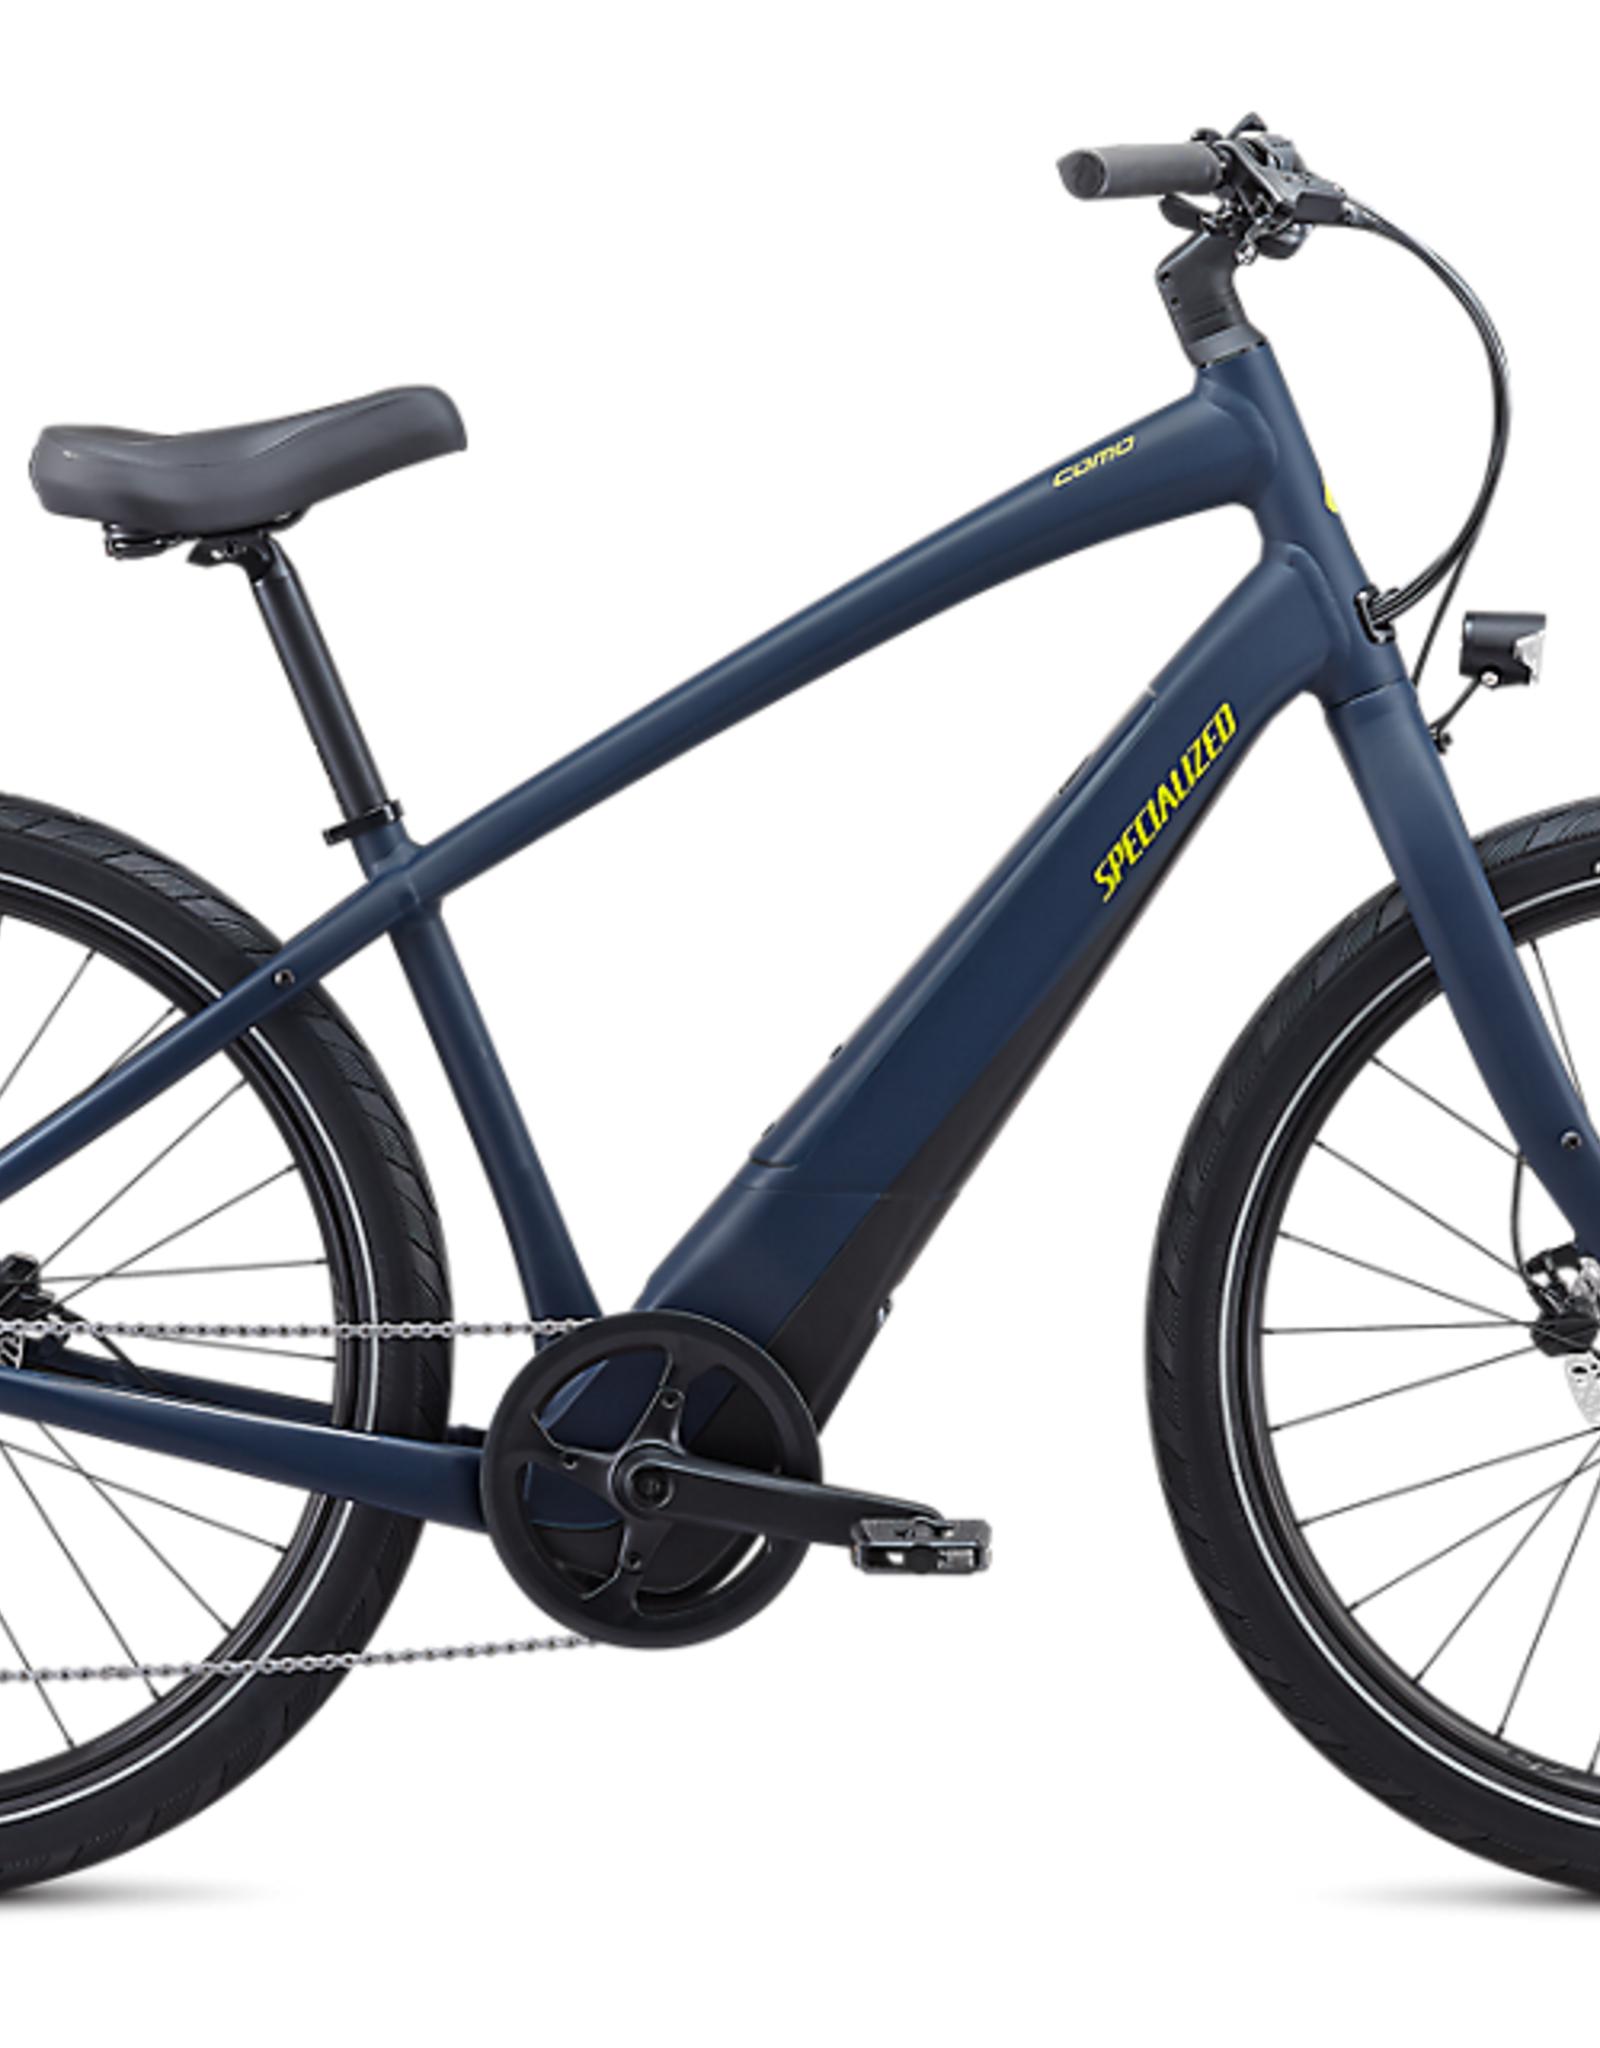 Specialized Specialized 2021 Como 3.0 650B E-Bike